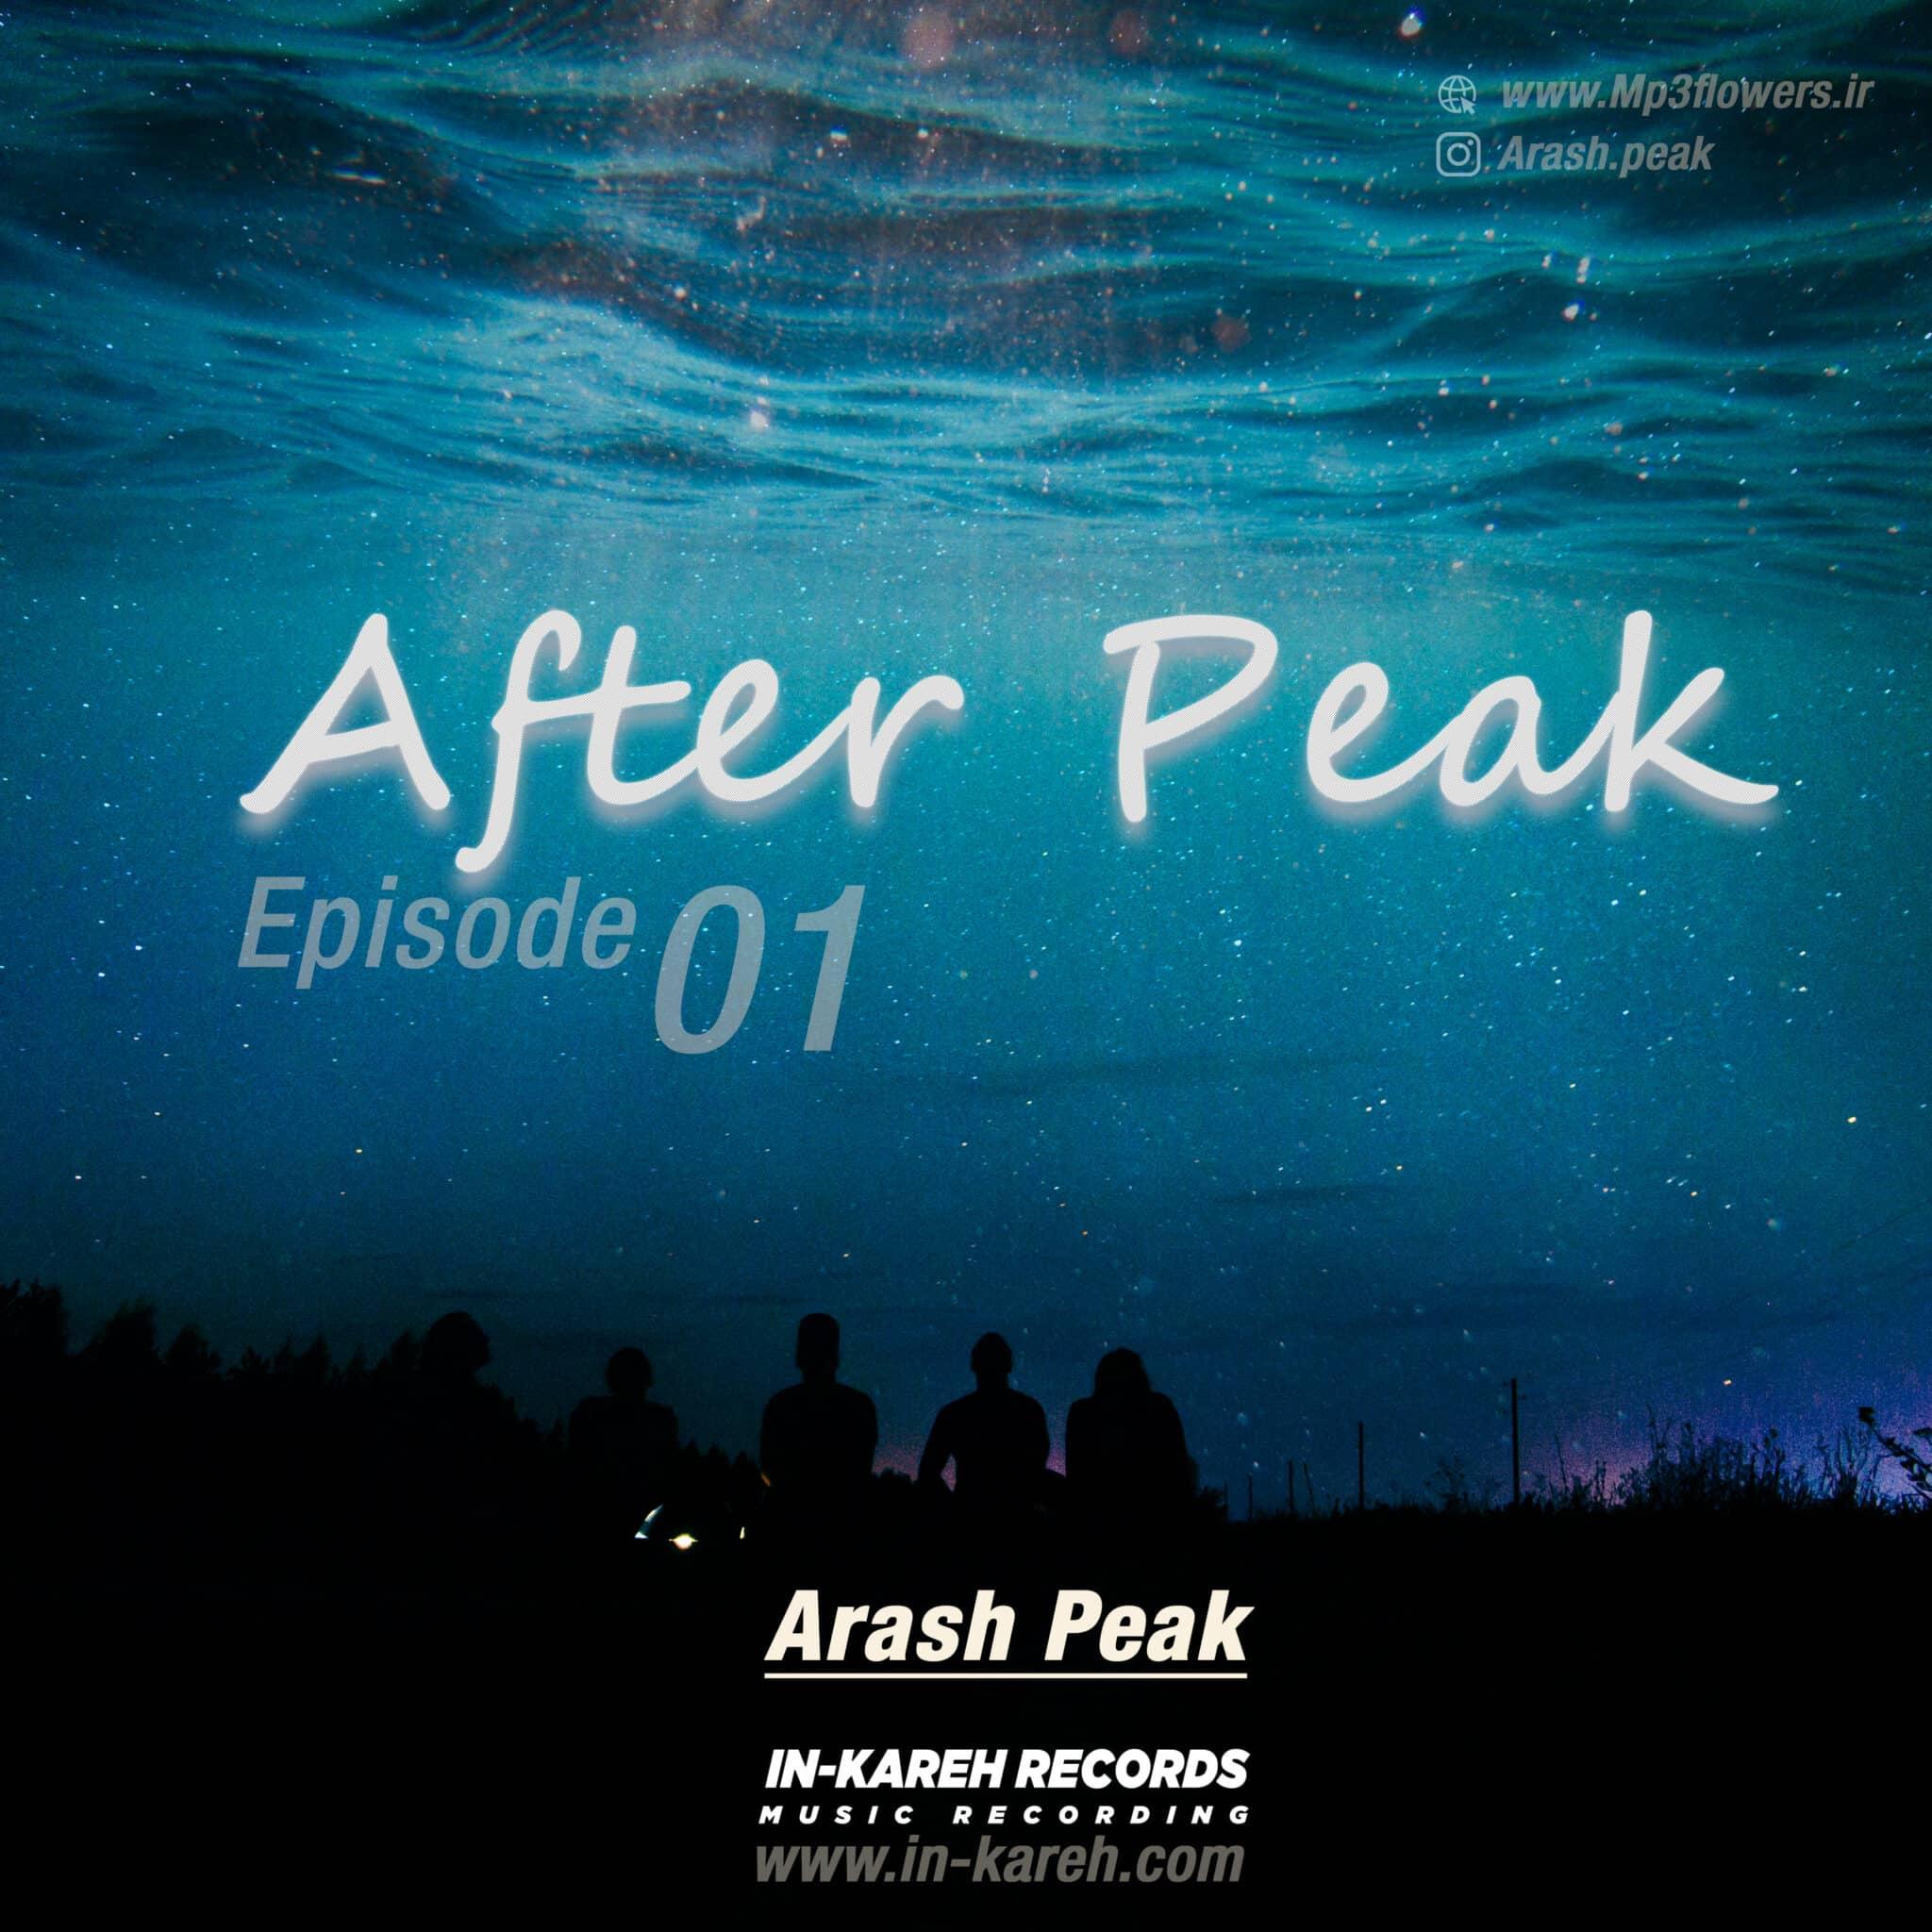 دانلود پادکست Arash Peak - After Peak [Episode 1]